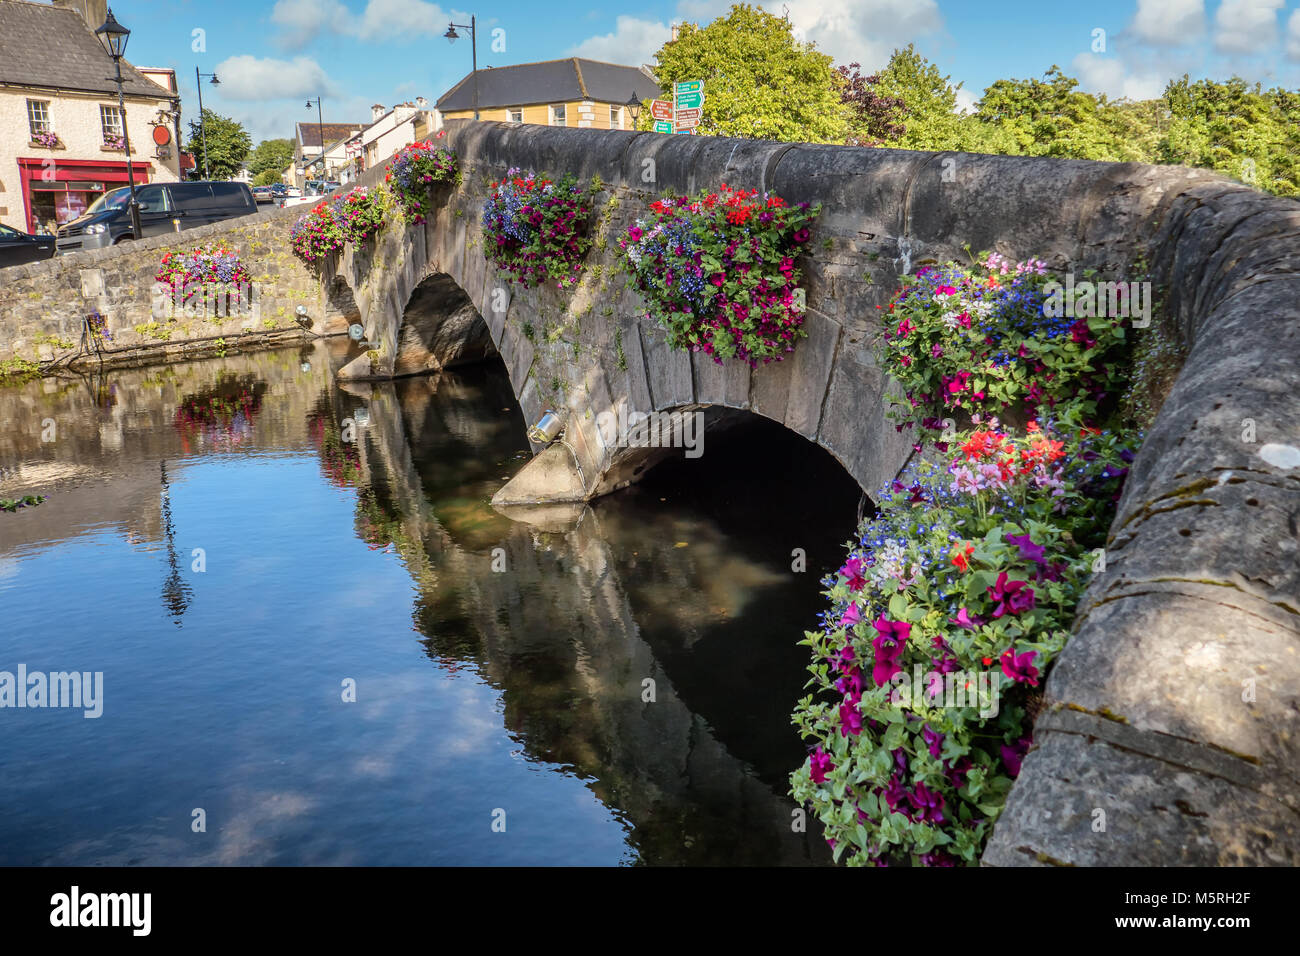 Westport bridge in county Mayo, Ireland - Stock Image